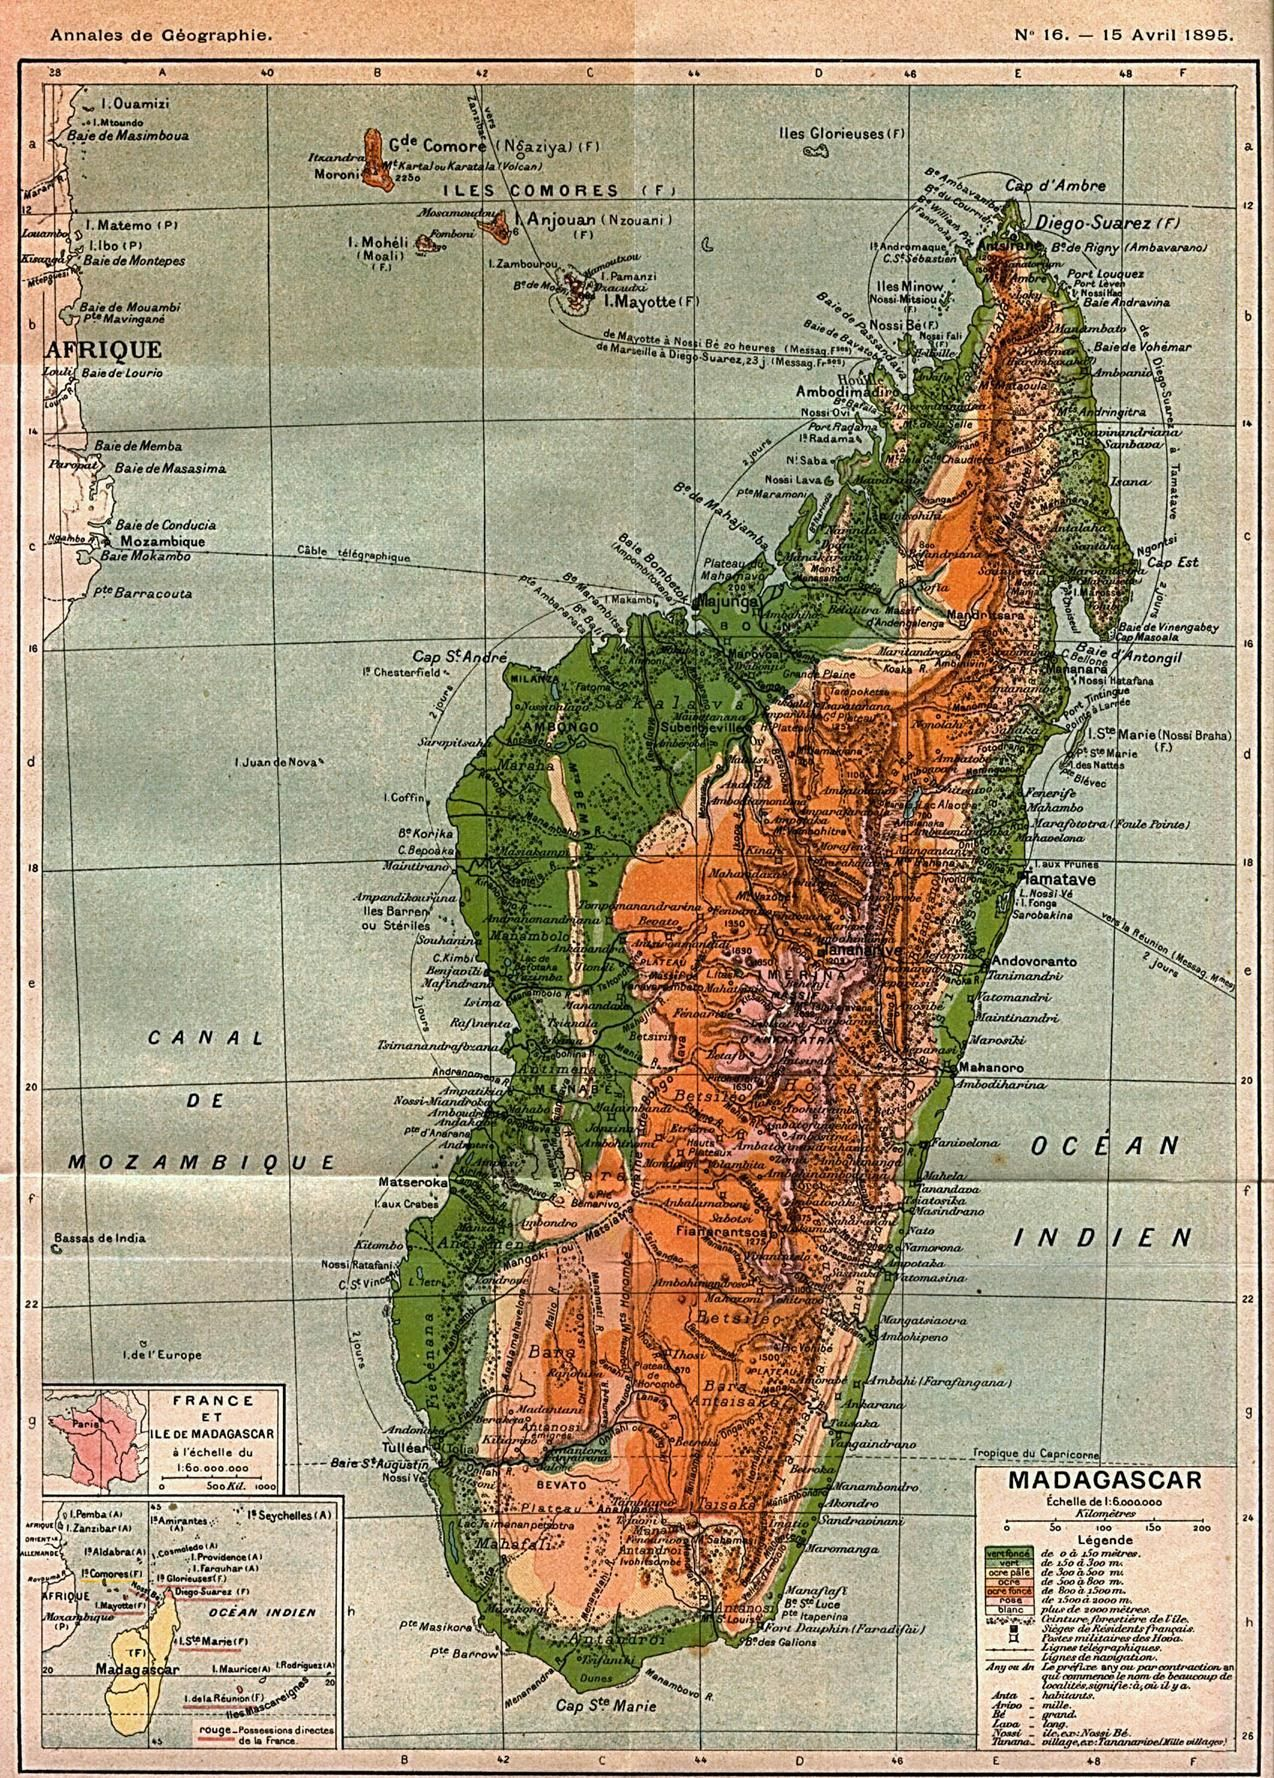 1895 map of madagascar mapmania pinterest madagascar 1895 map of madagascar gumiabroncs Gallery